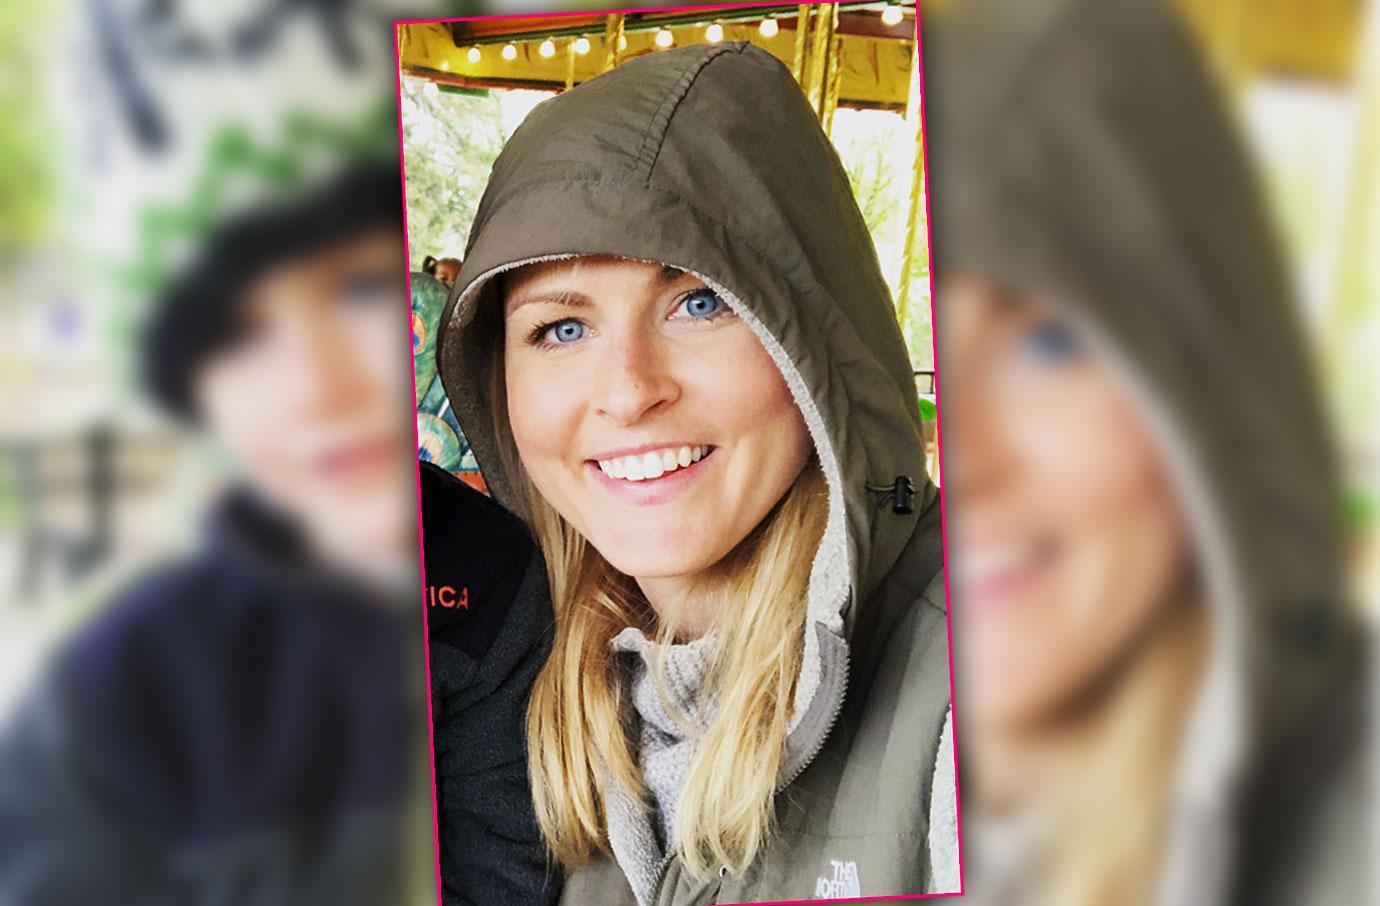 fox 2 meteorologist suicide family devastated mom interview